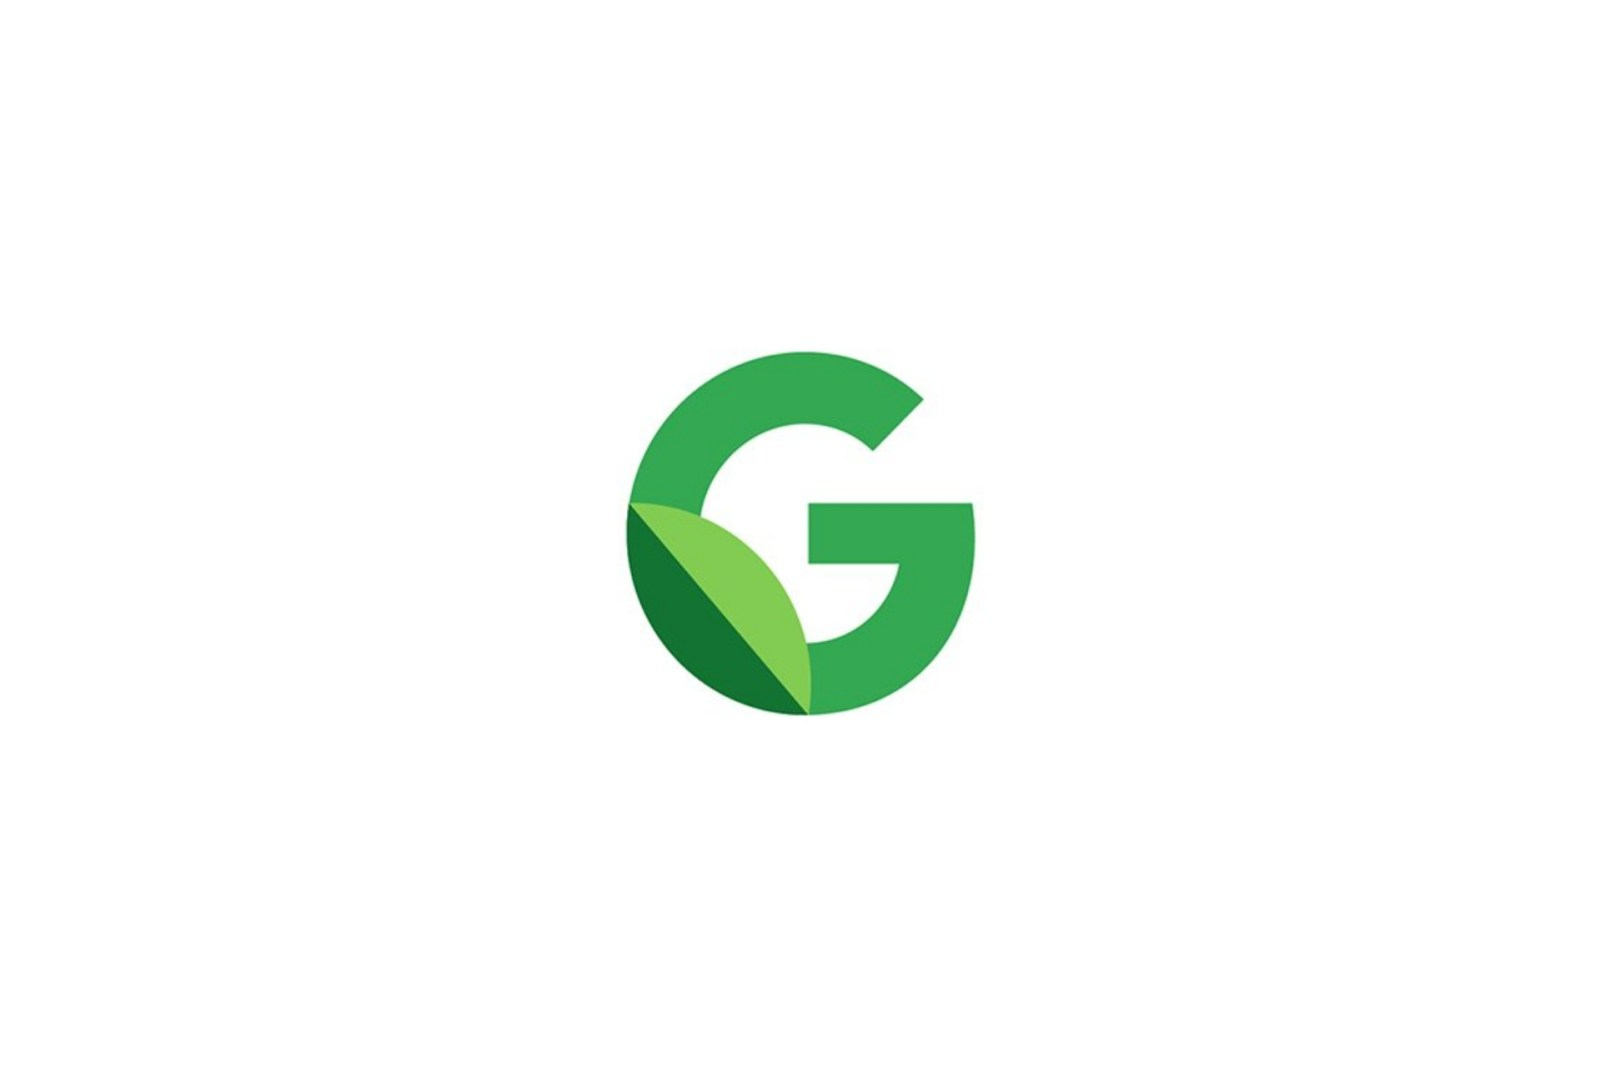 Google CEO Sundar Pichai Promise to Carbon-free Energy by 2030